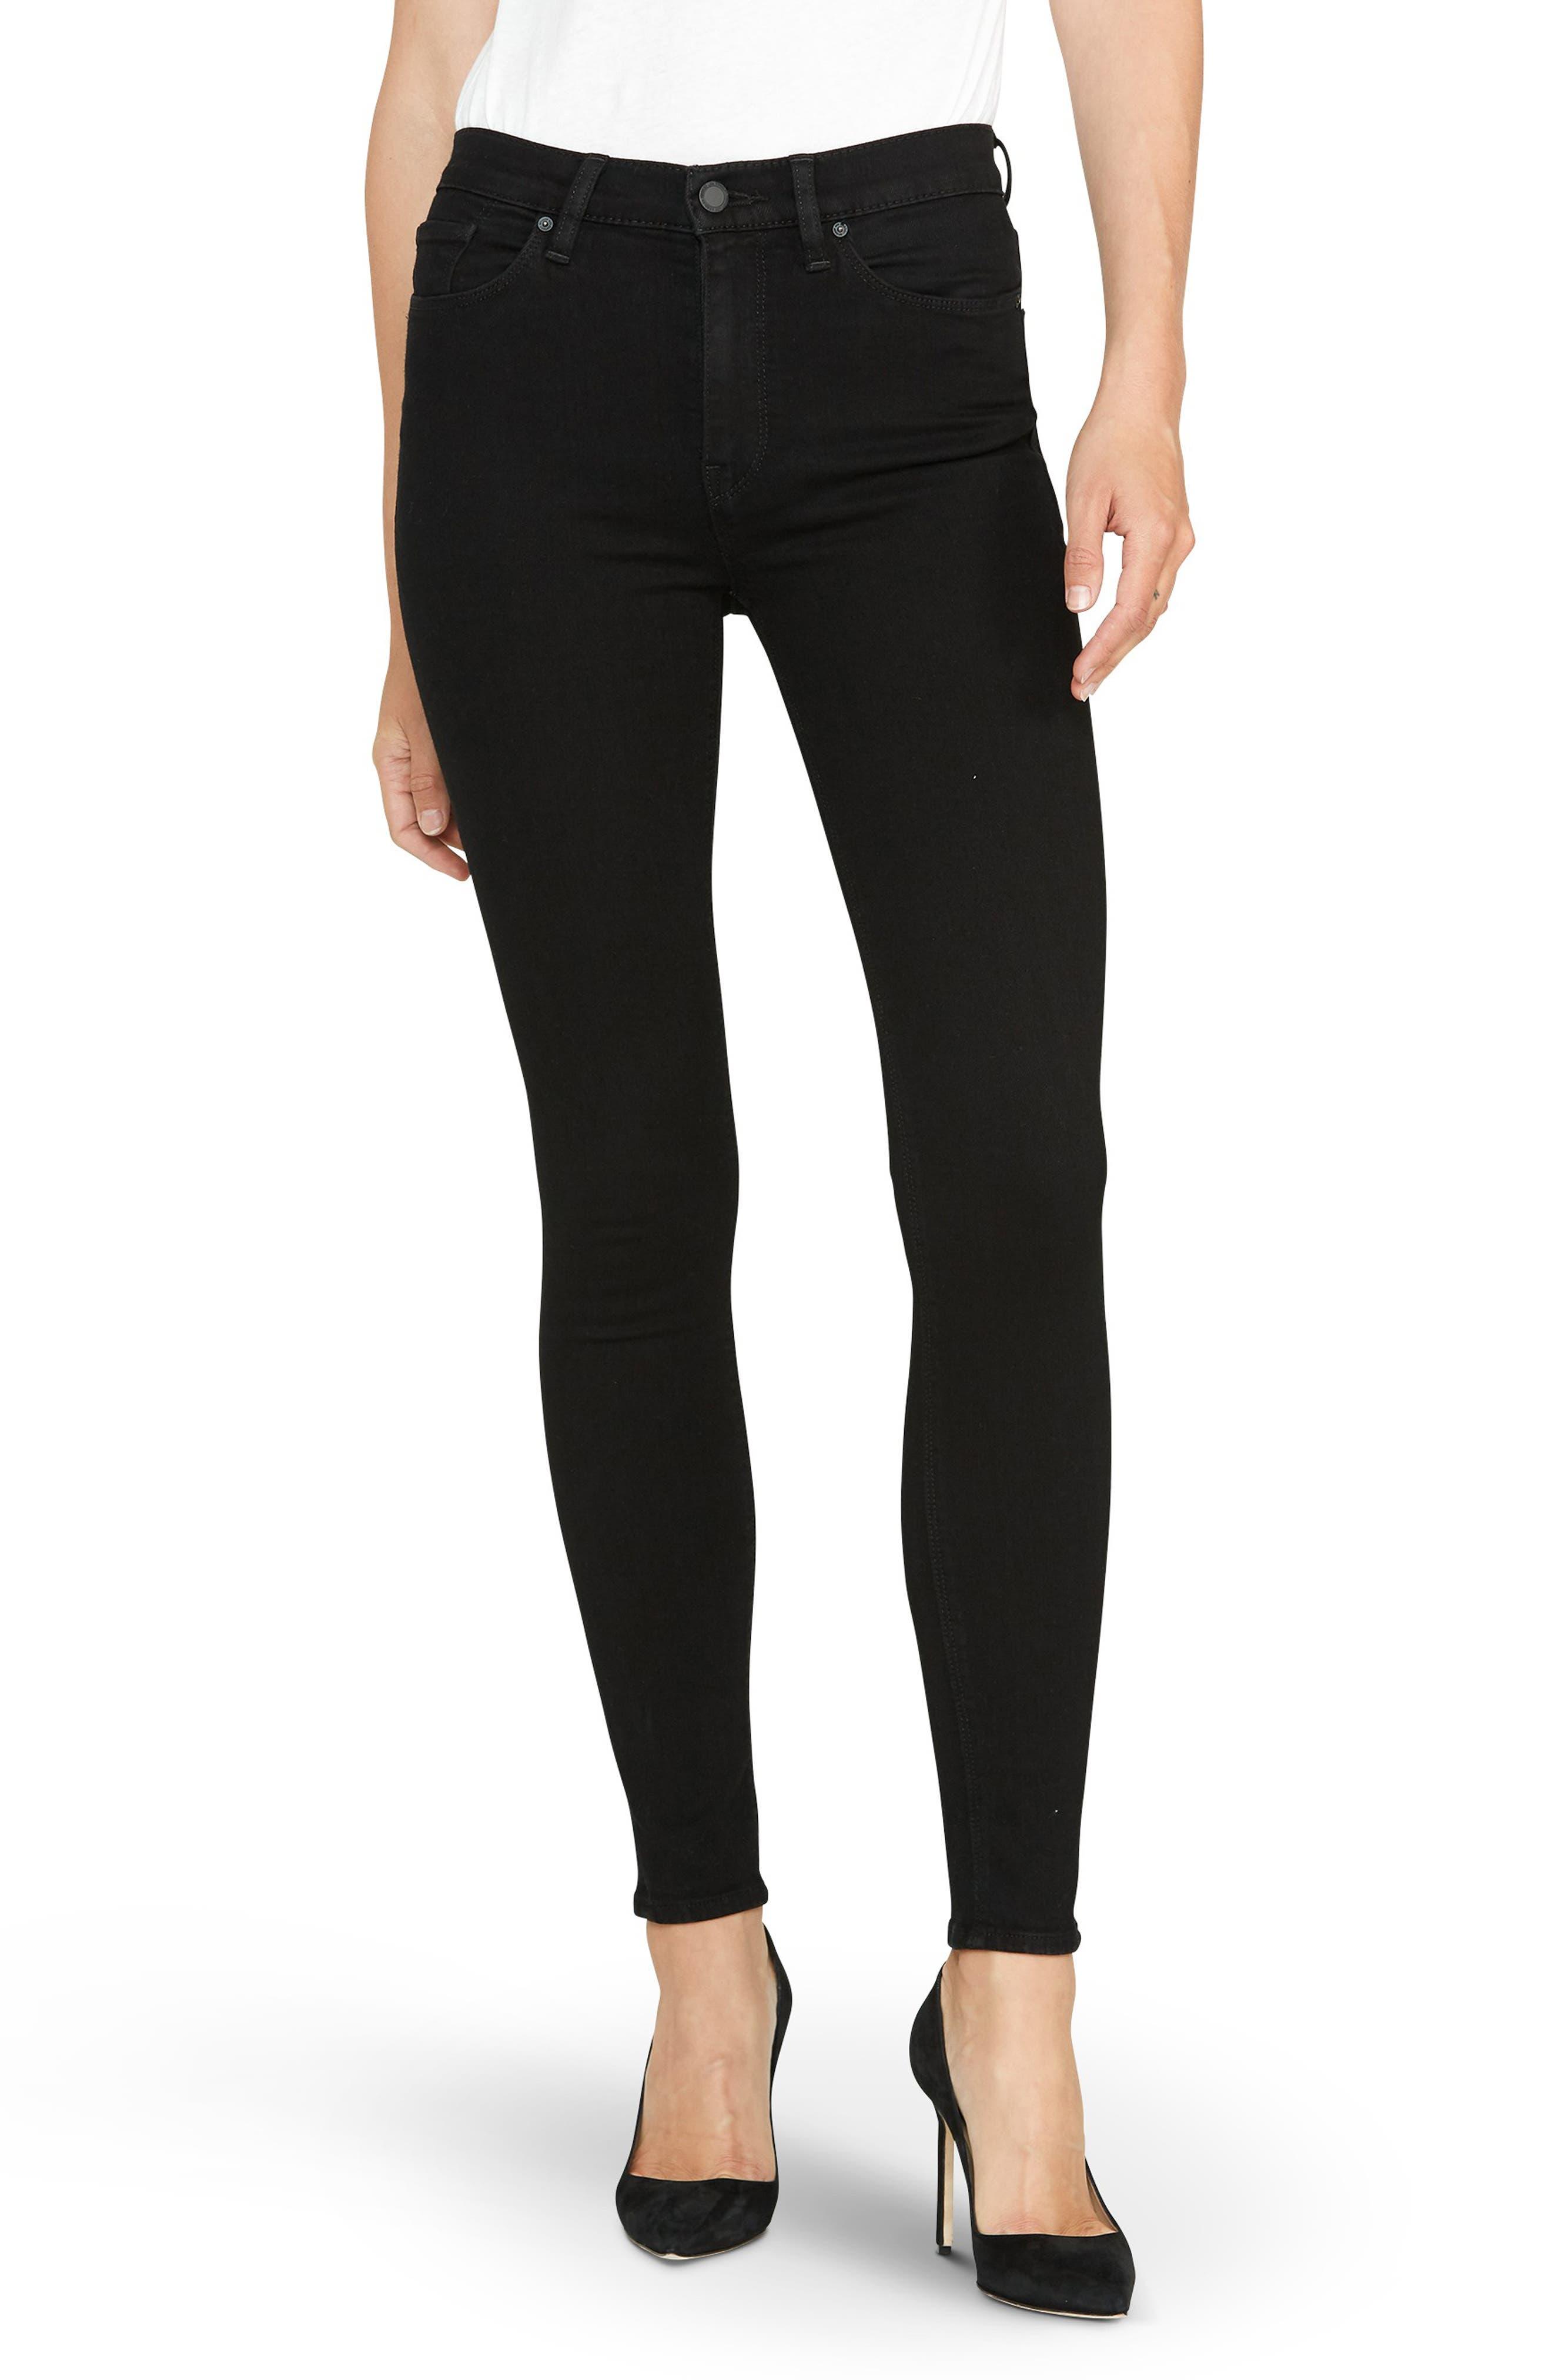 Women's Hudson Jeans Barbara High Waist Super Skinny Jeans